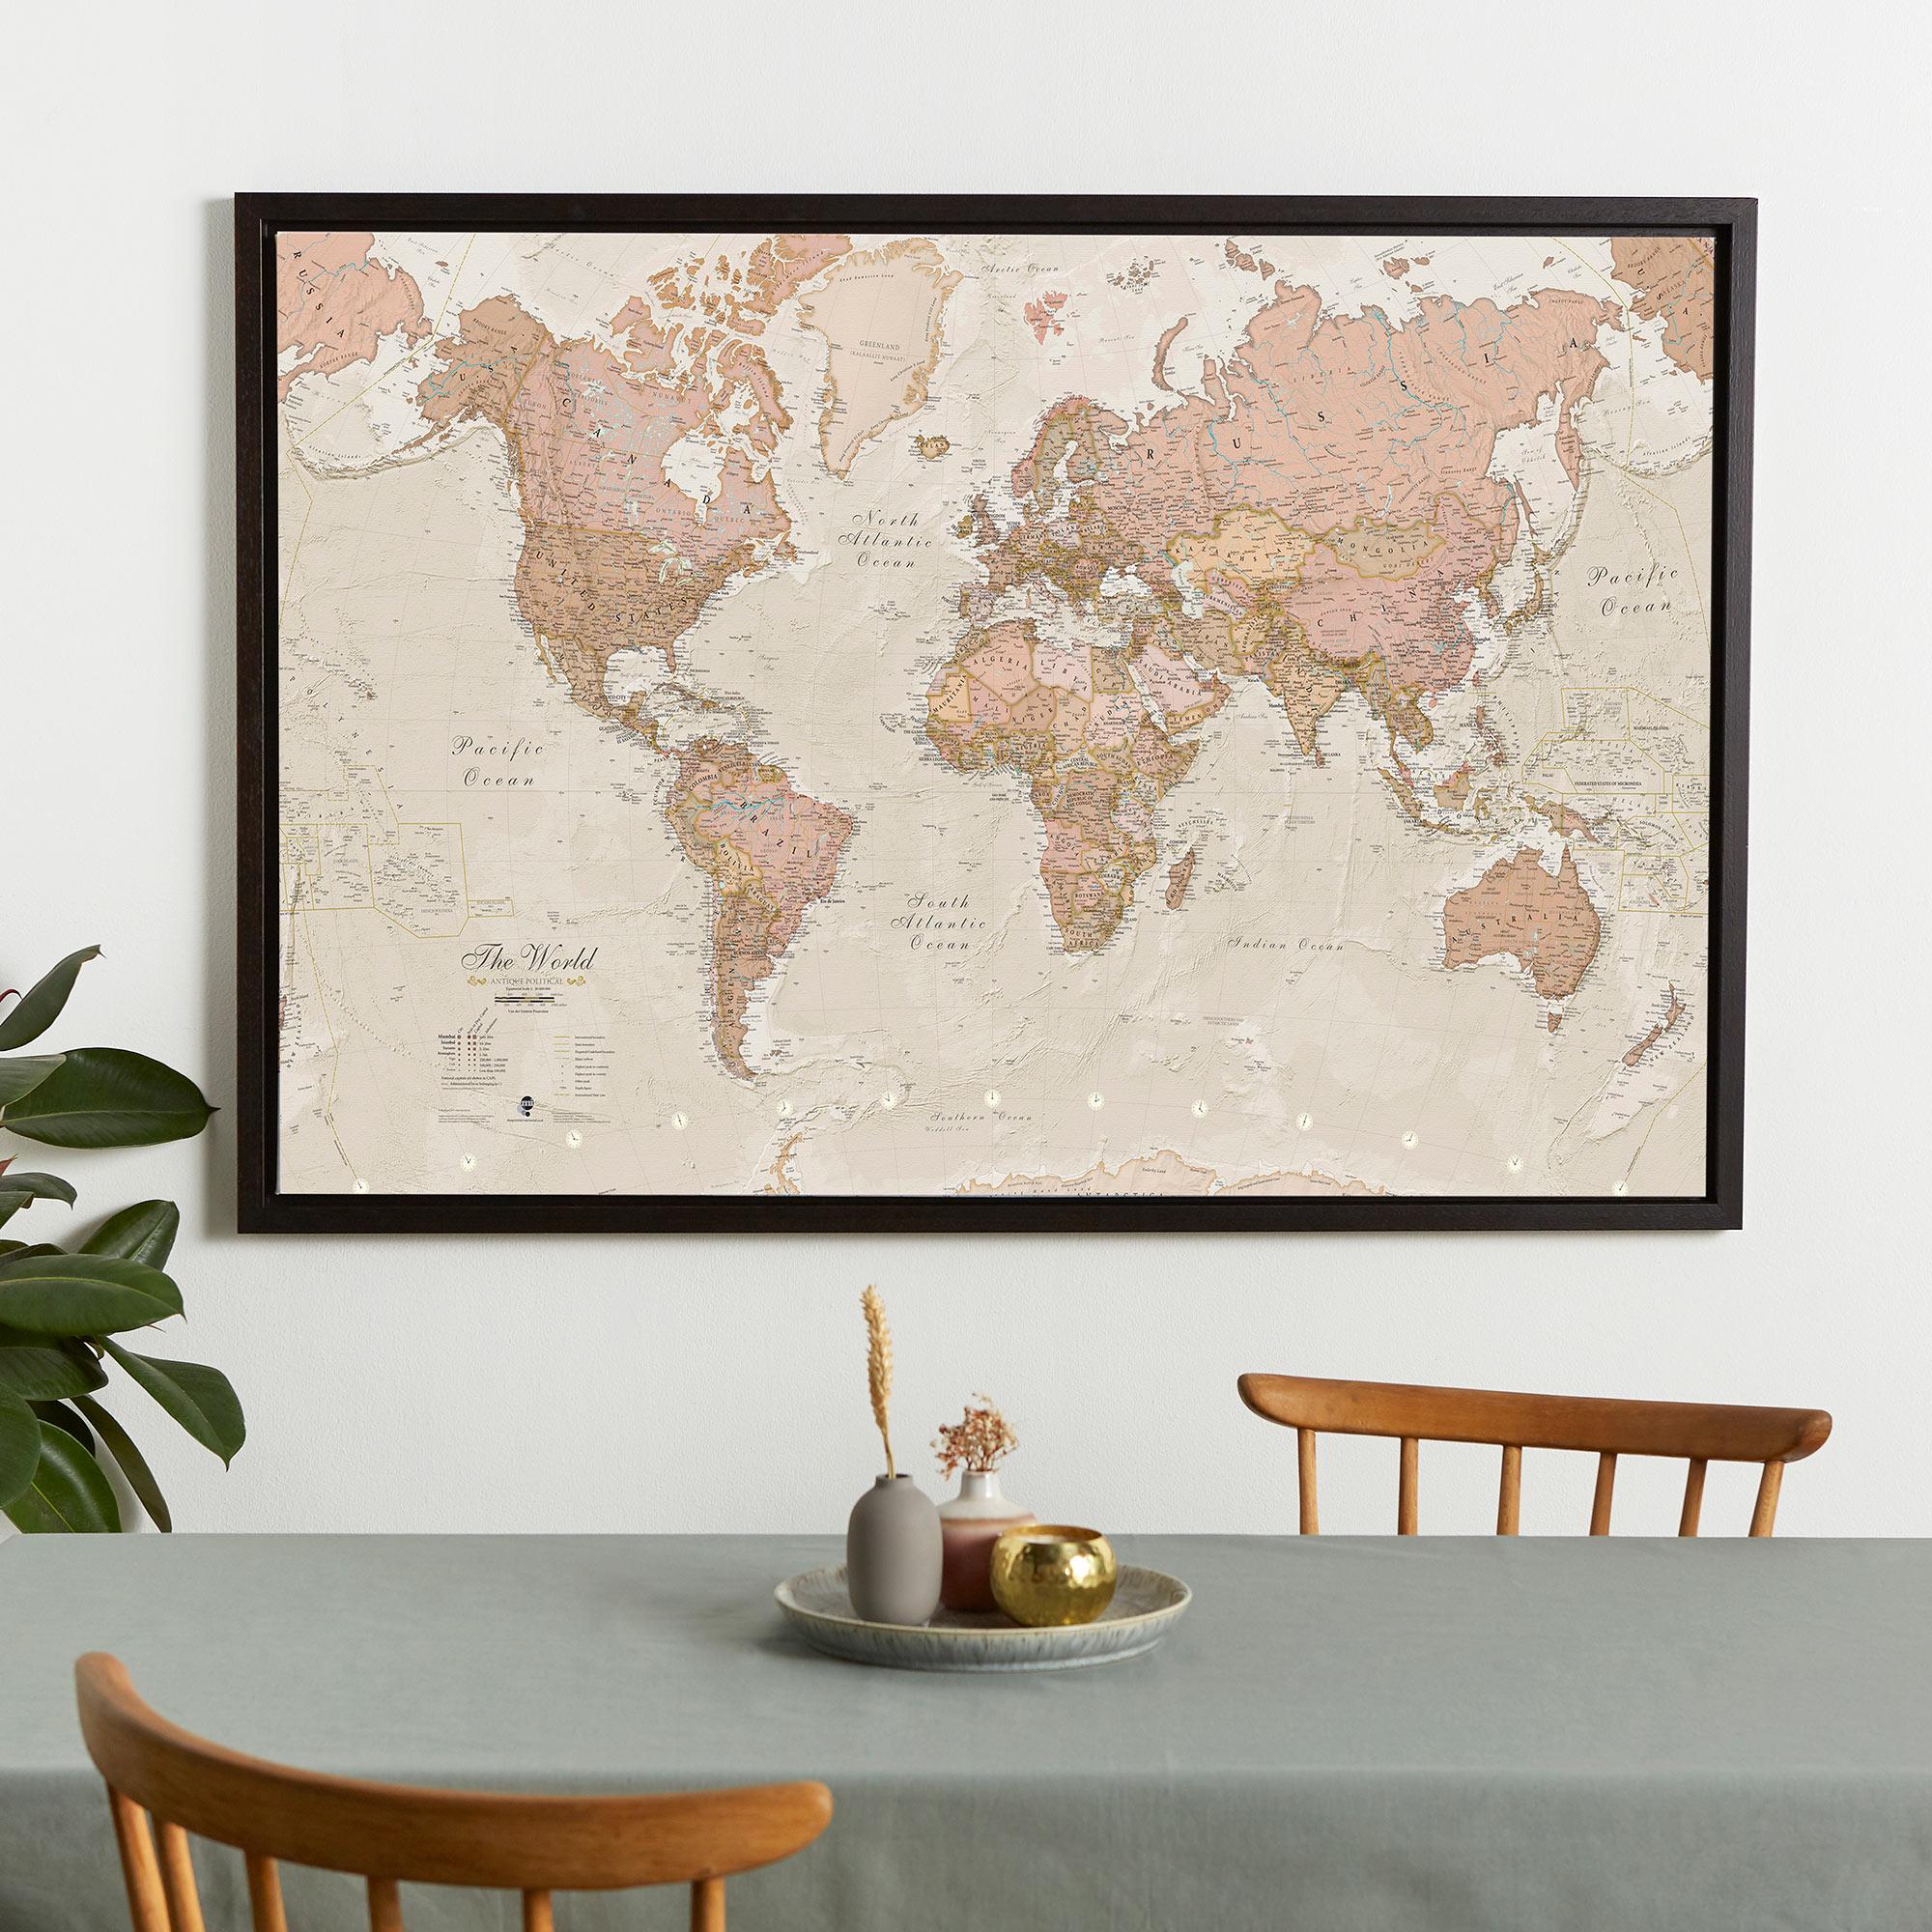 framed world map - Antique world map canvas floater